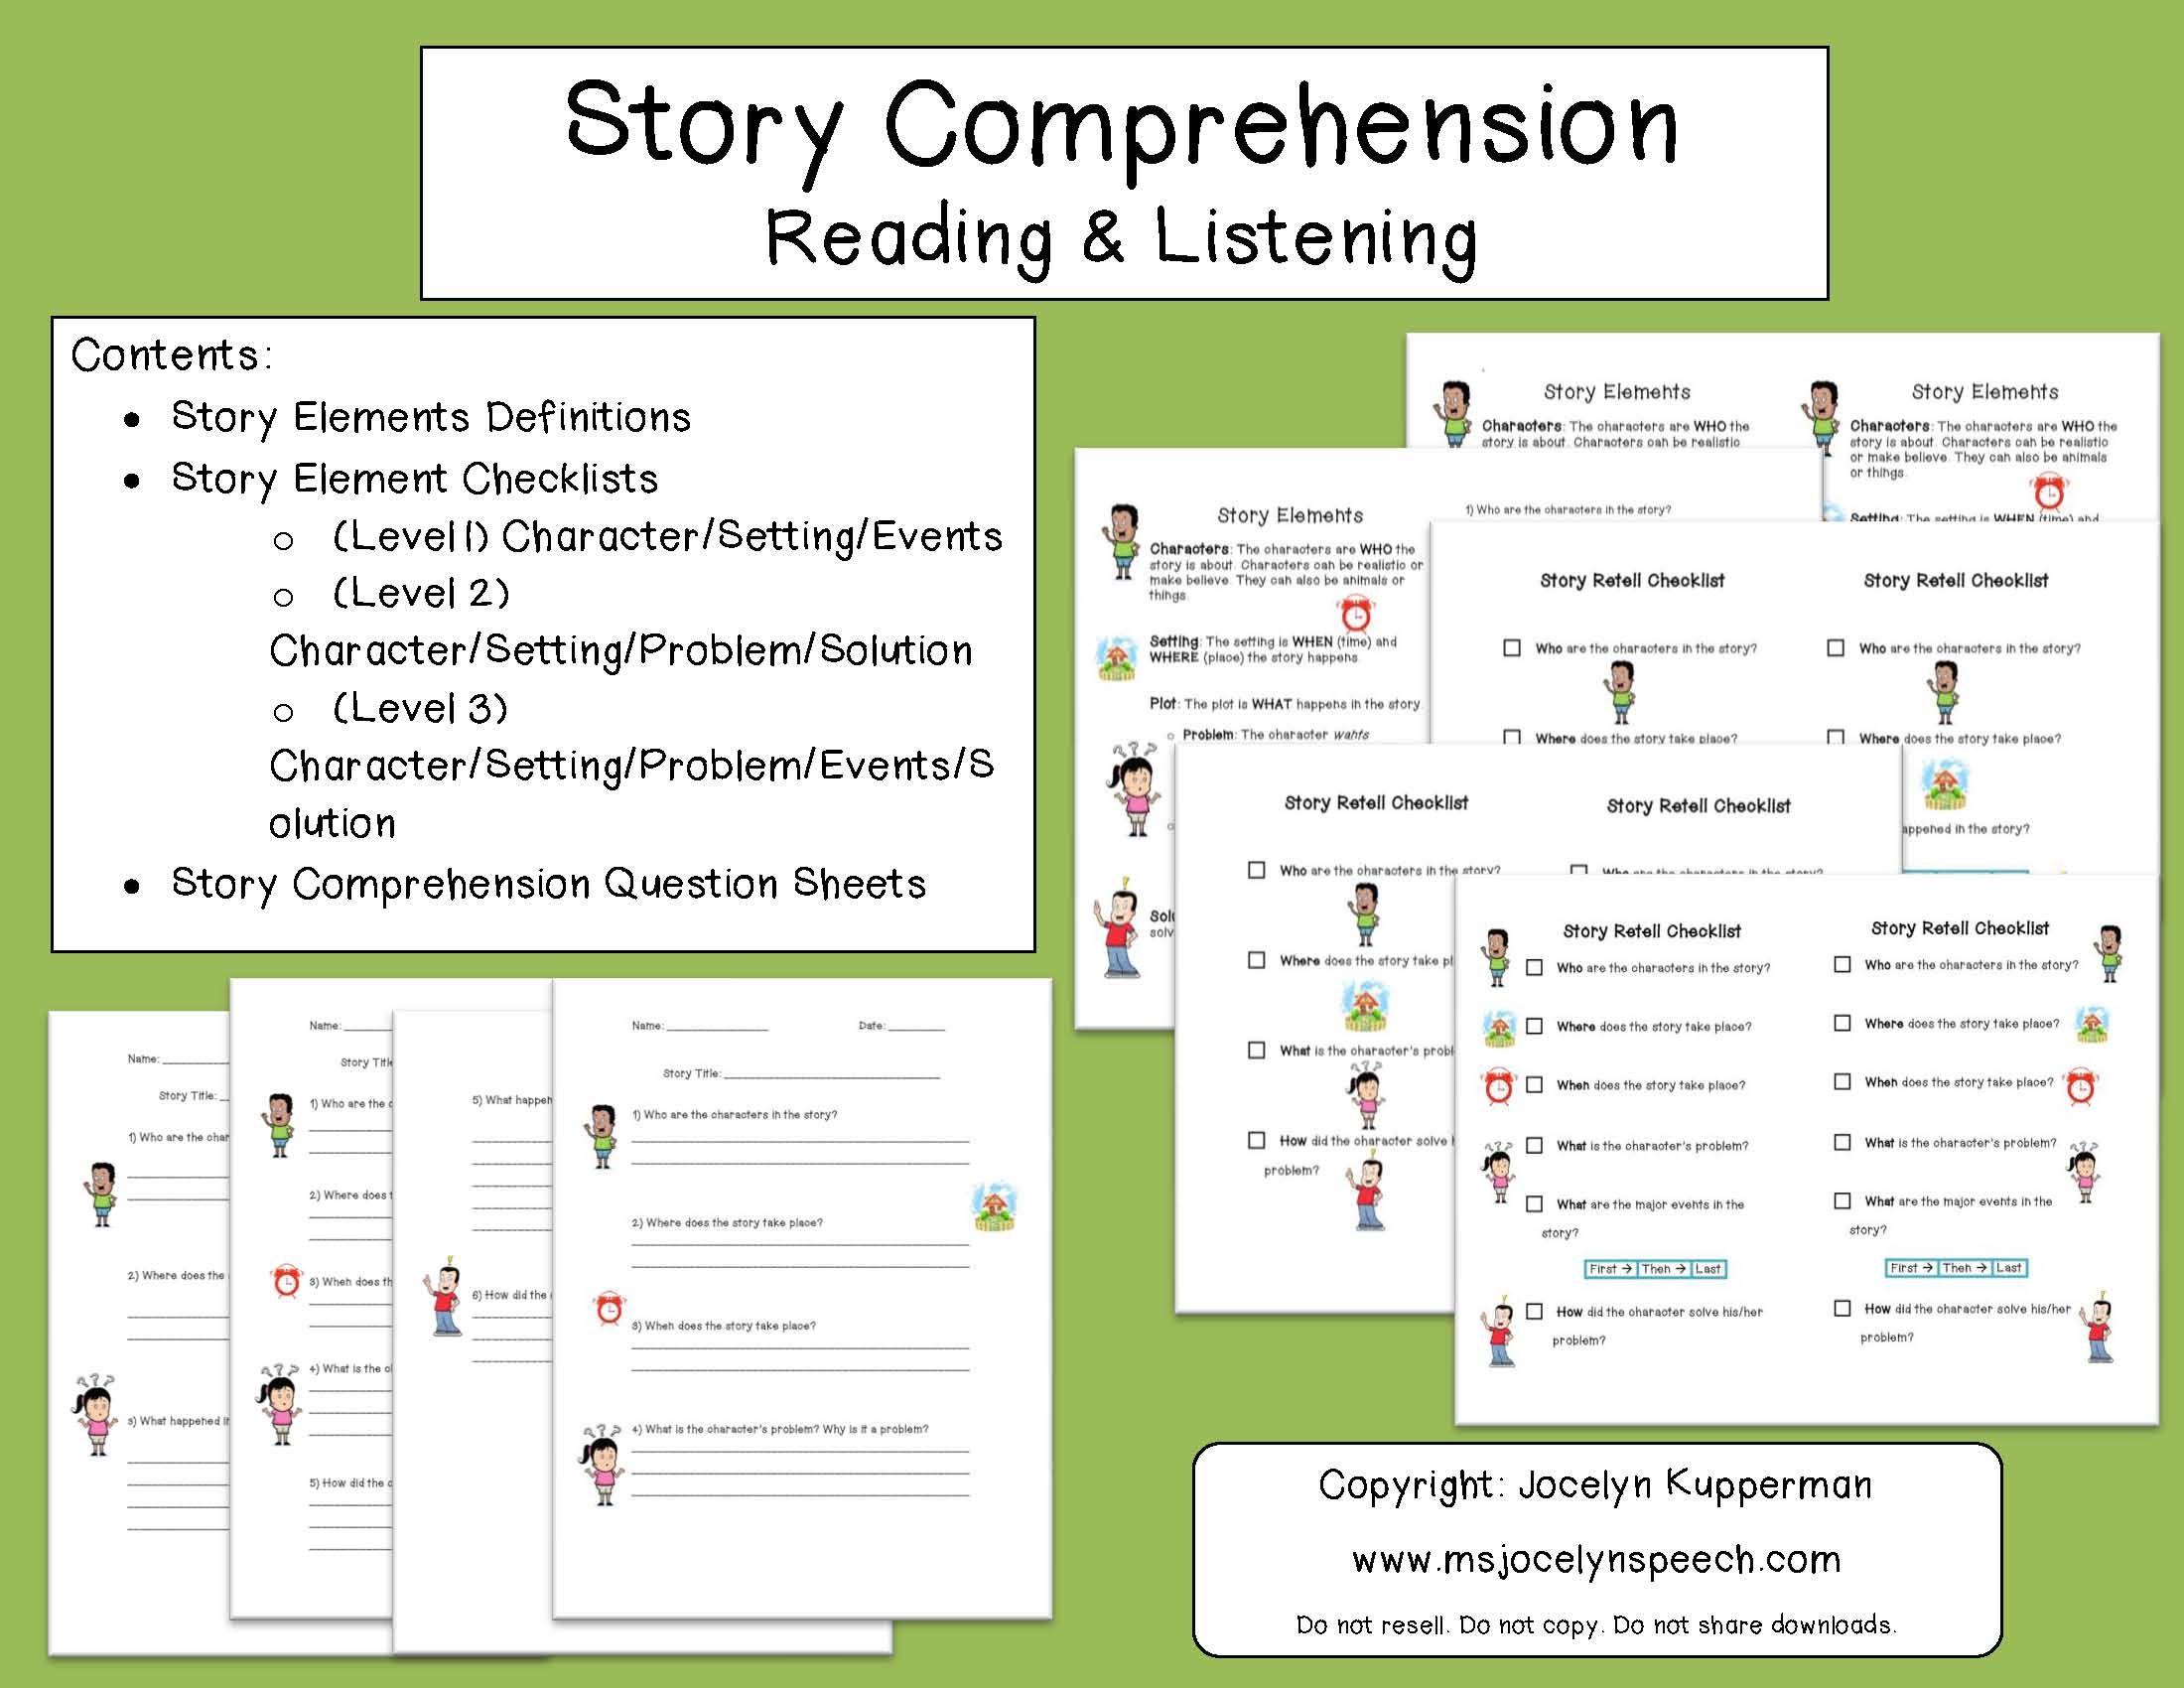 Story Comprehension Blog Intro